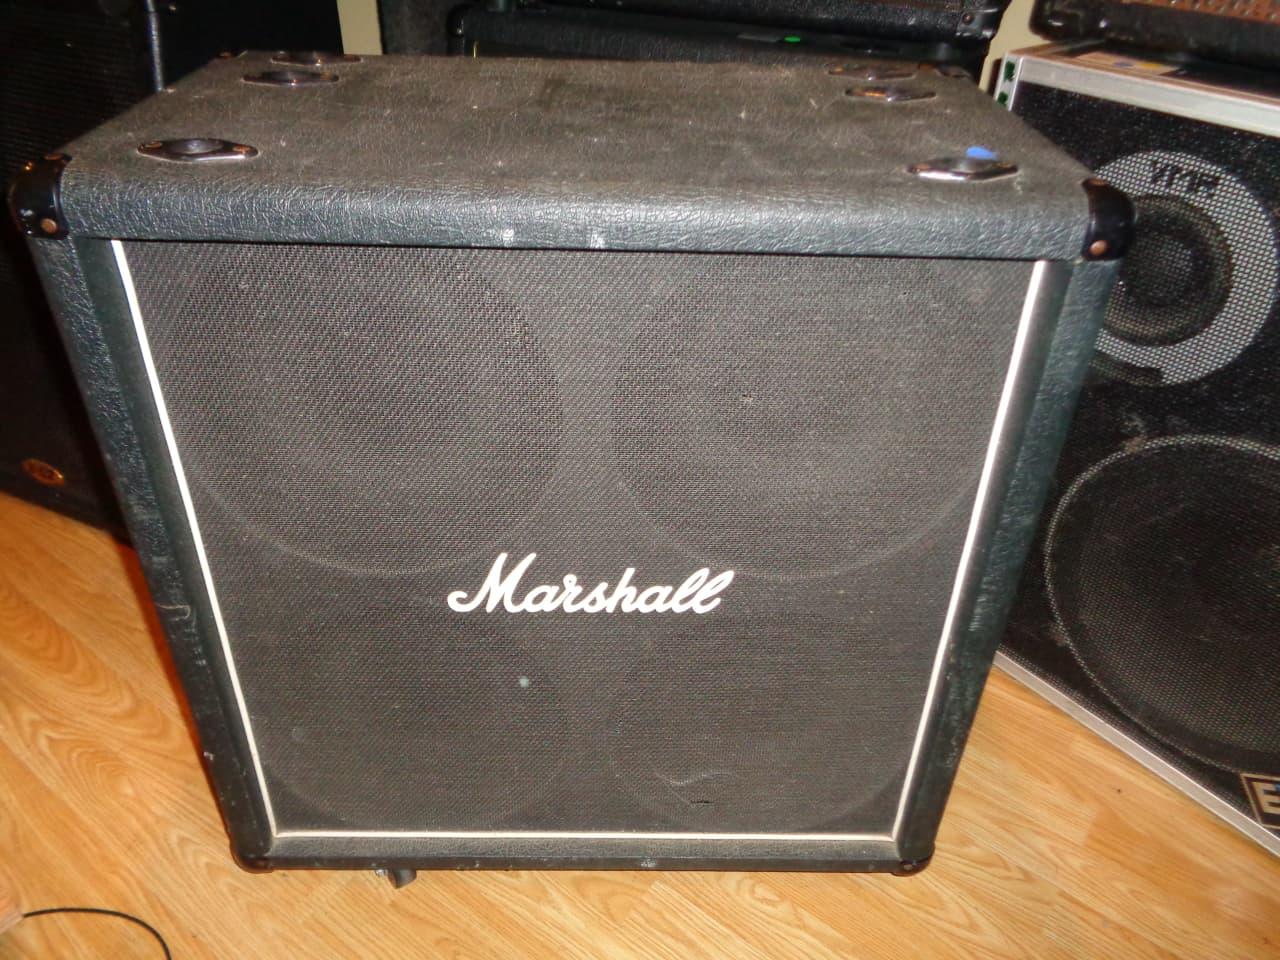 used Marshall Lead 4x12 412 guitar speaker cabinet Model 8412 | Reverb